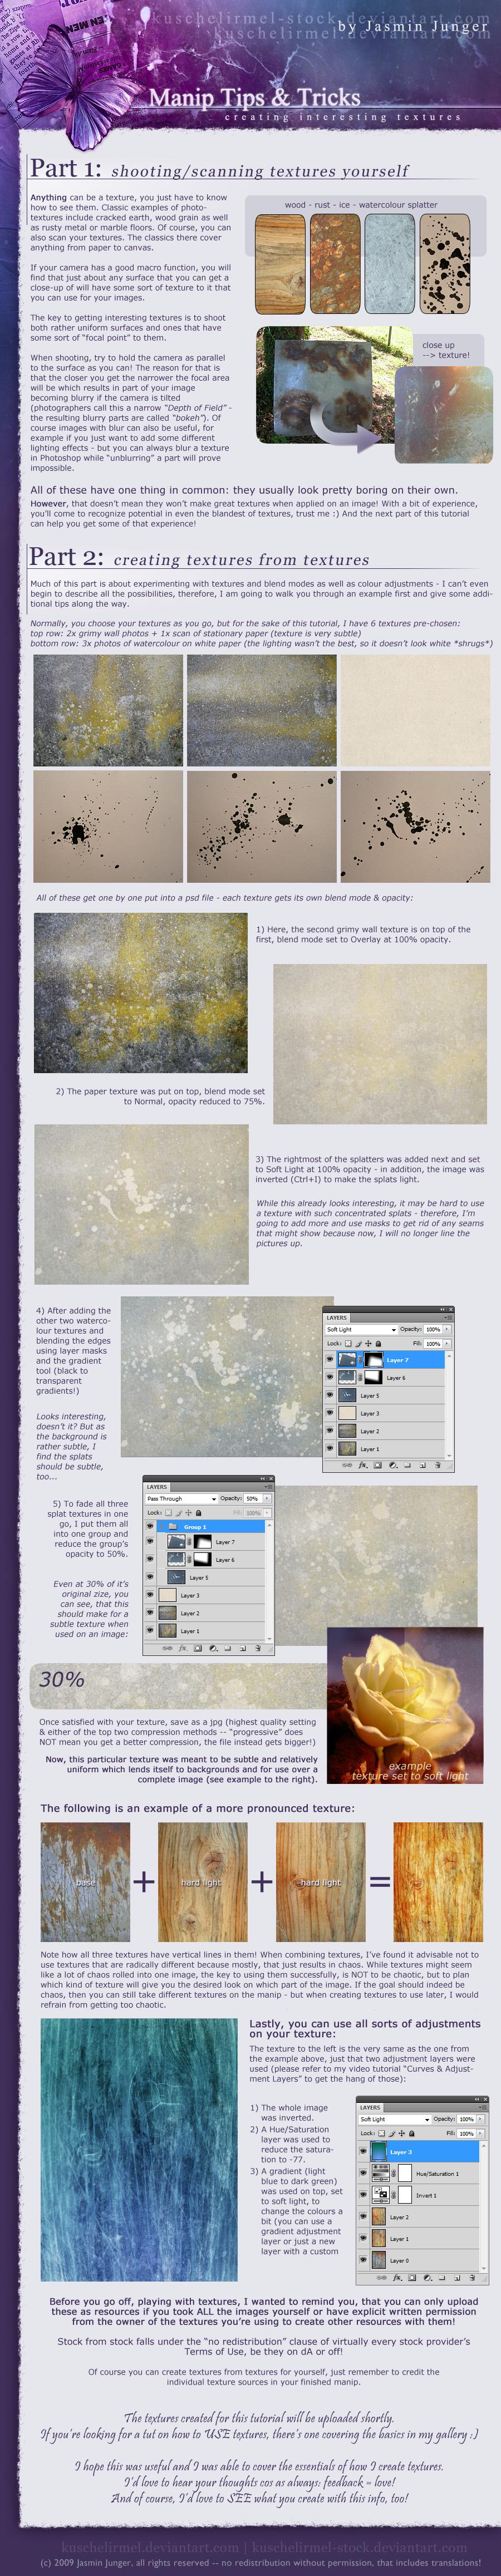 Manip T+T: Creating Textures by kuschelirmel-stock